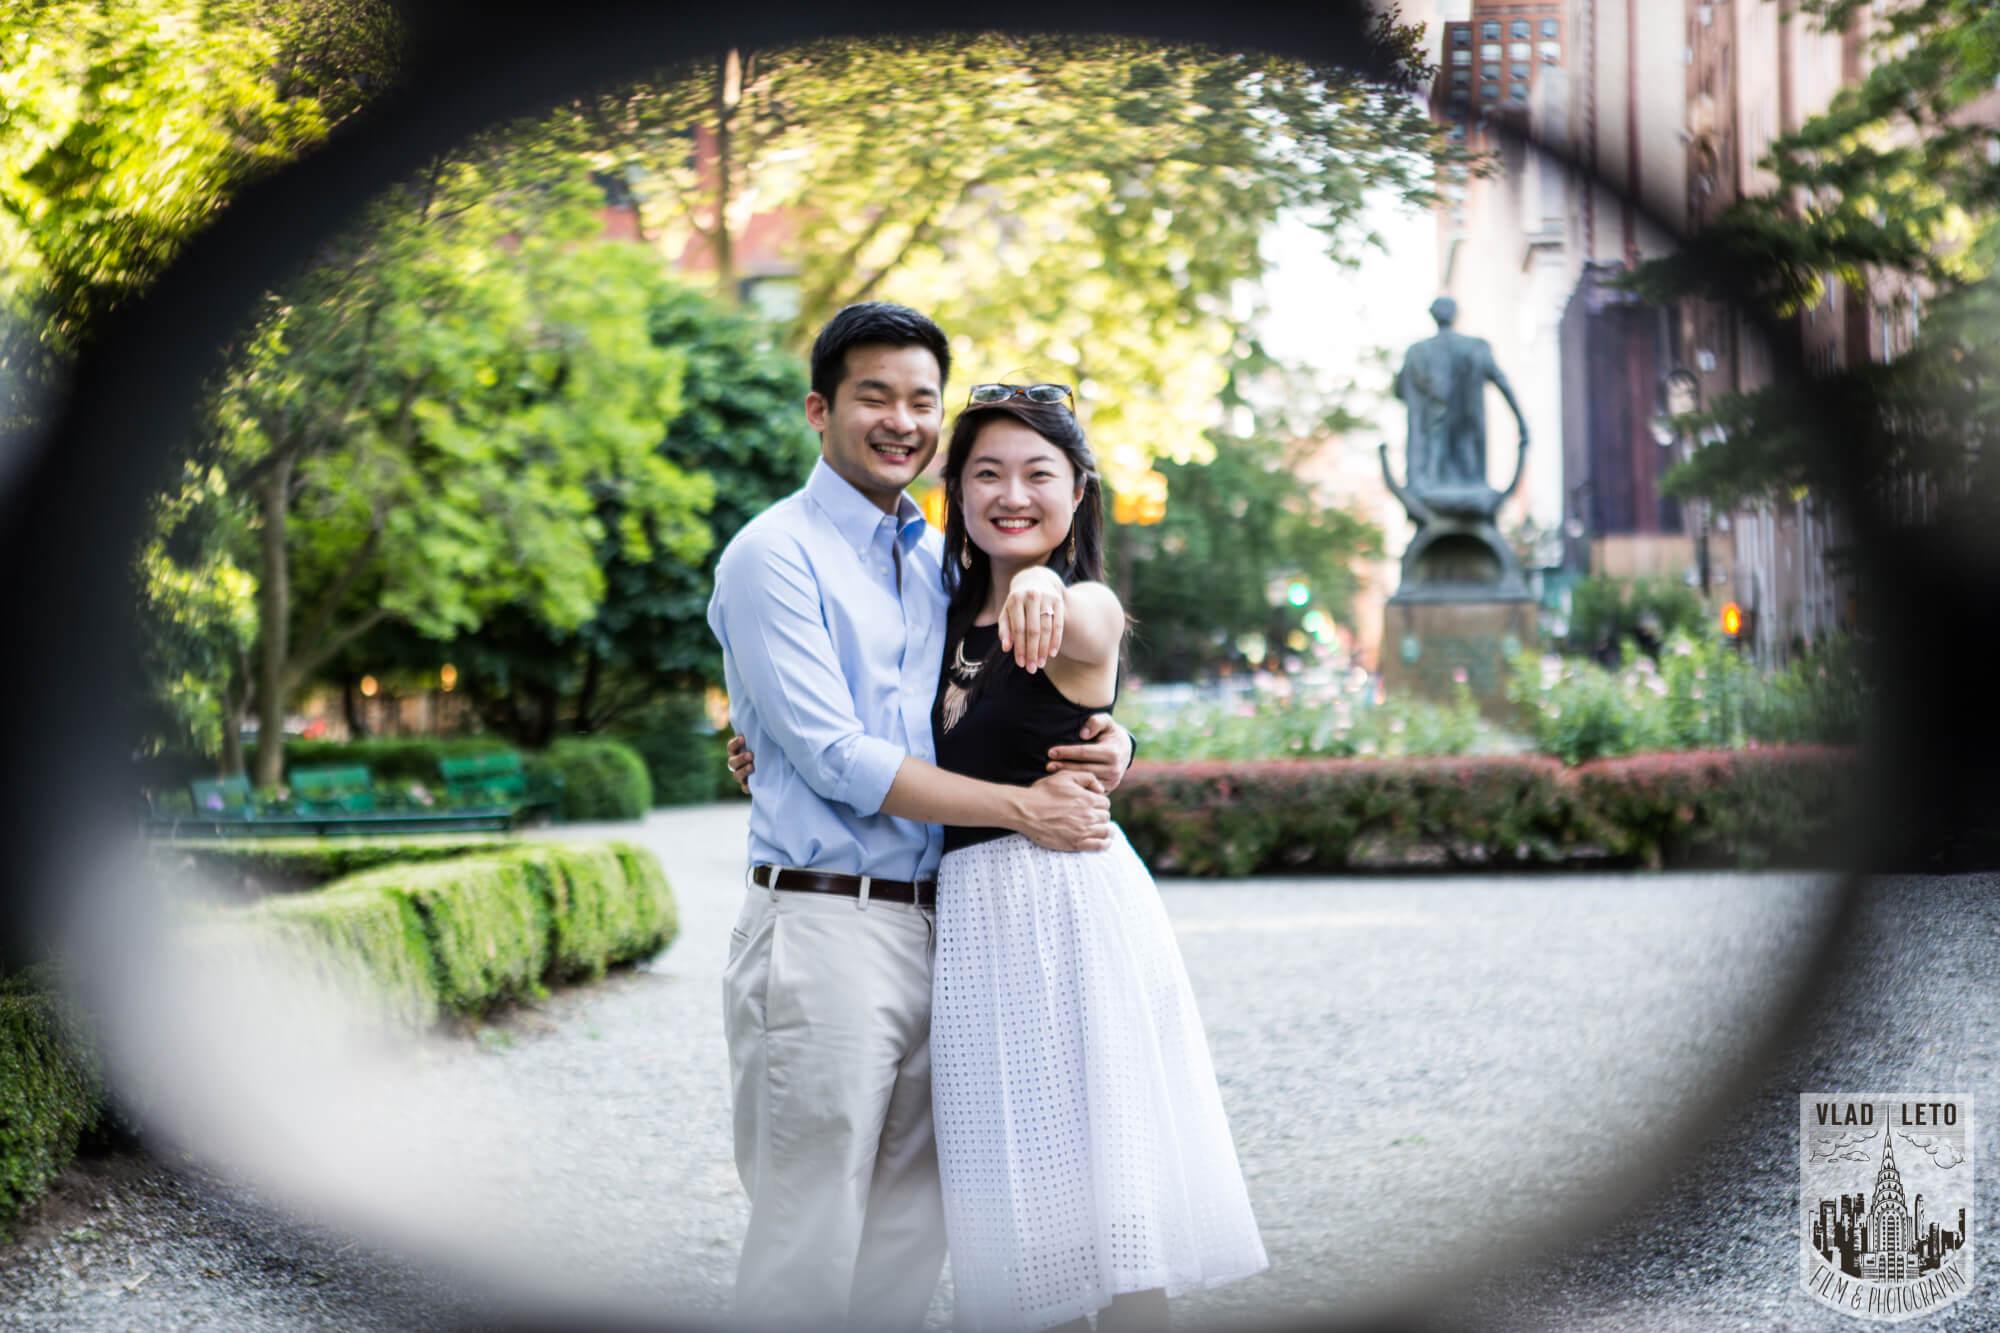 Photo 5 Gramercy Park Marriage Proposal   VladLeto